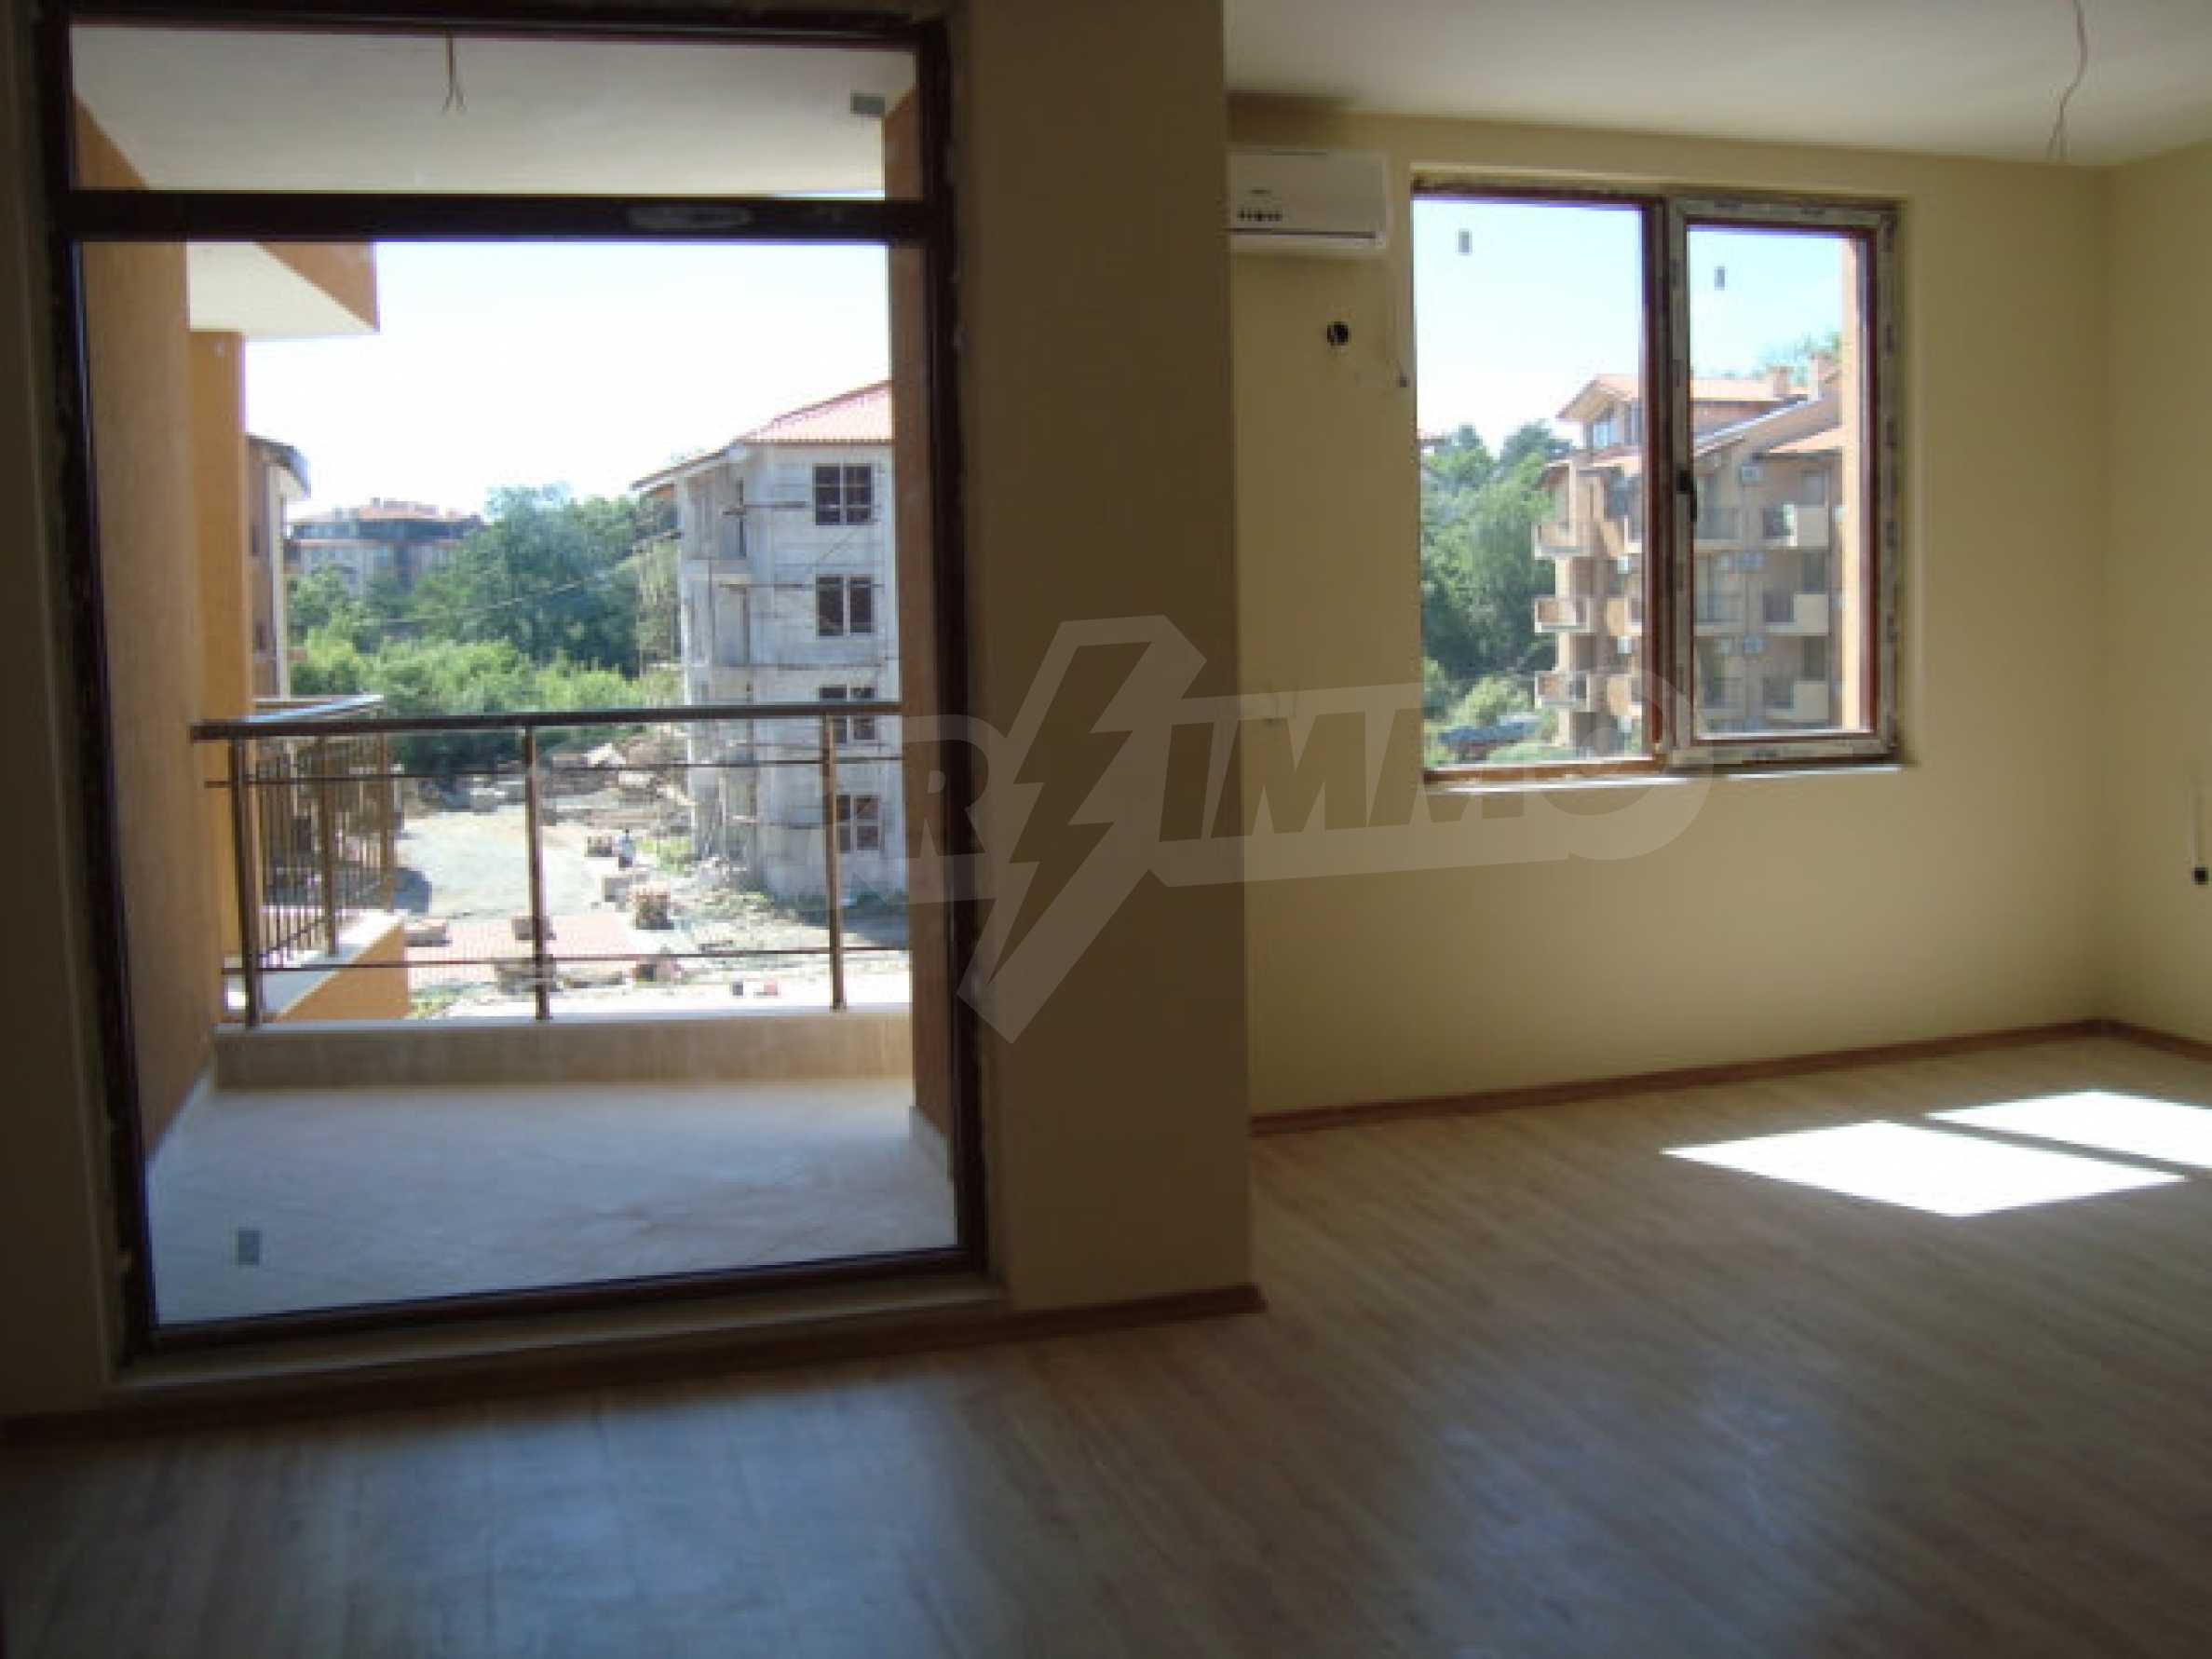 Studios und Apartments im Nestinarka-Komplex in Tsarevo 26